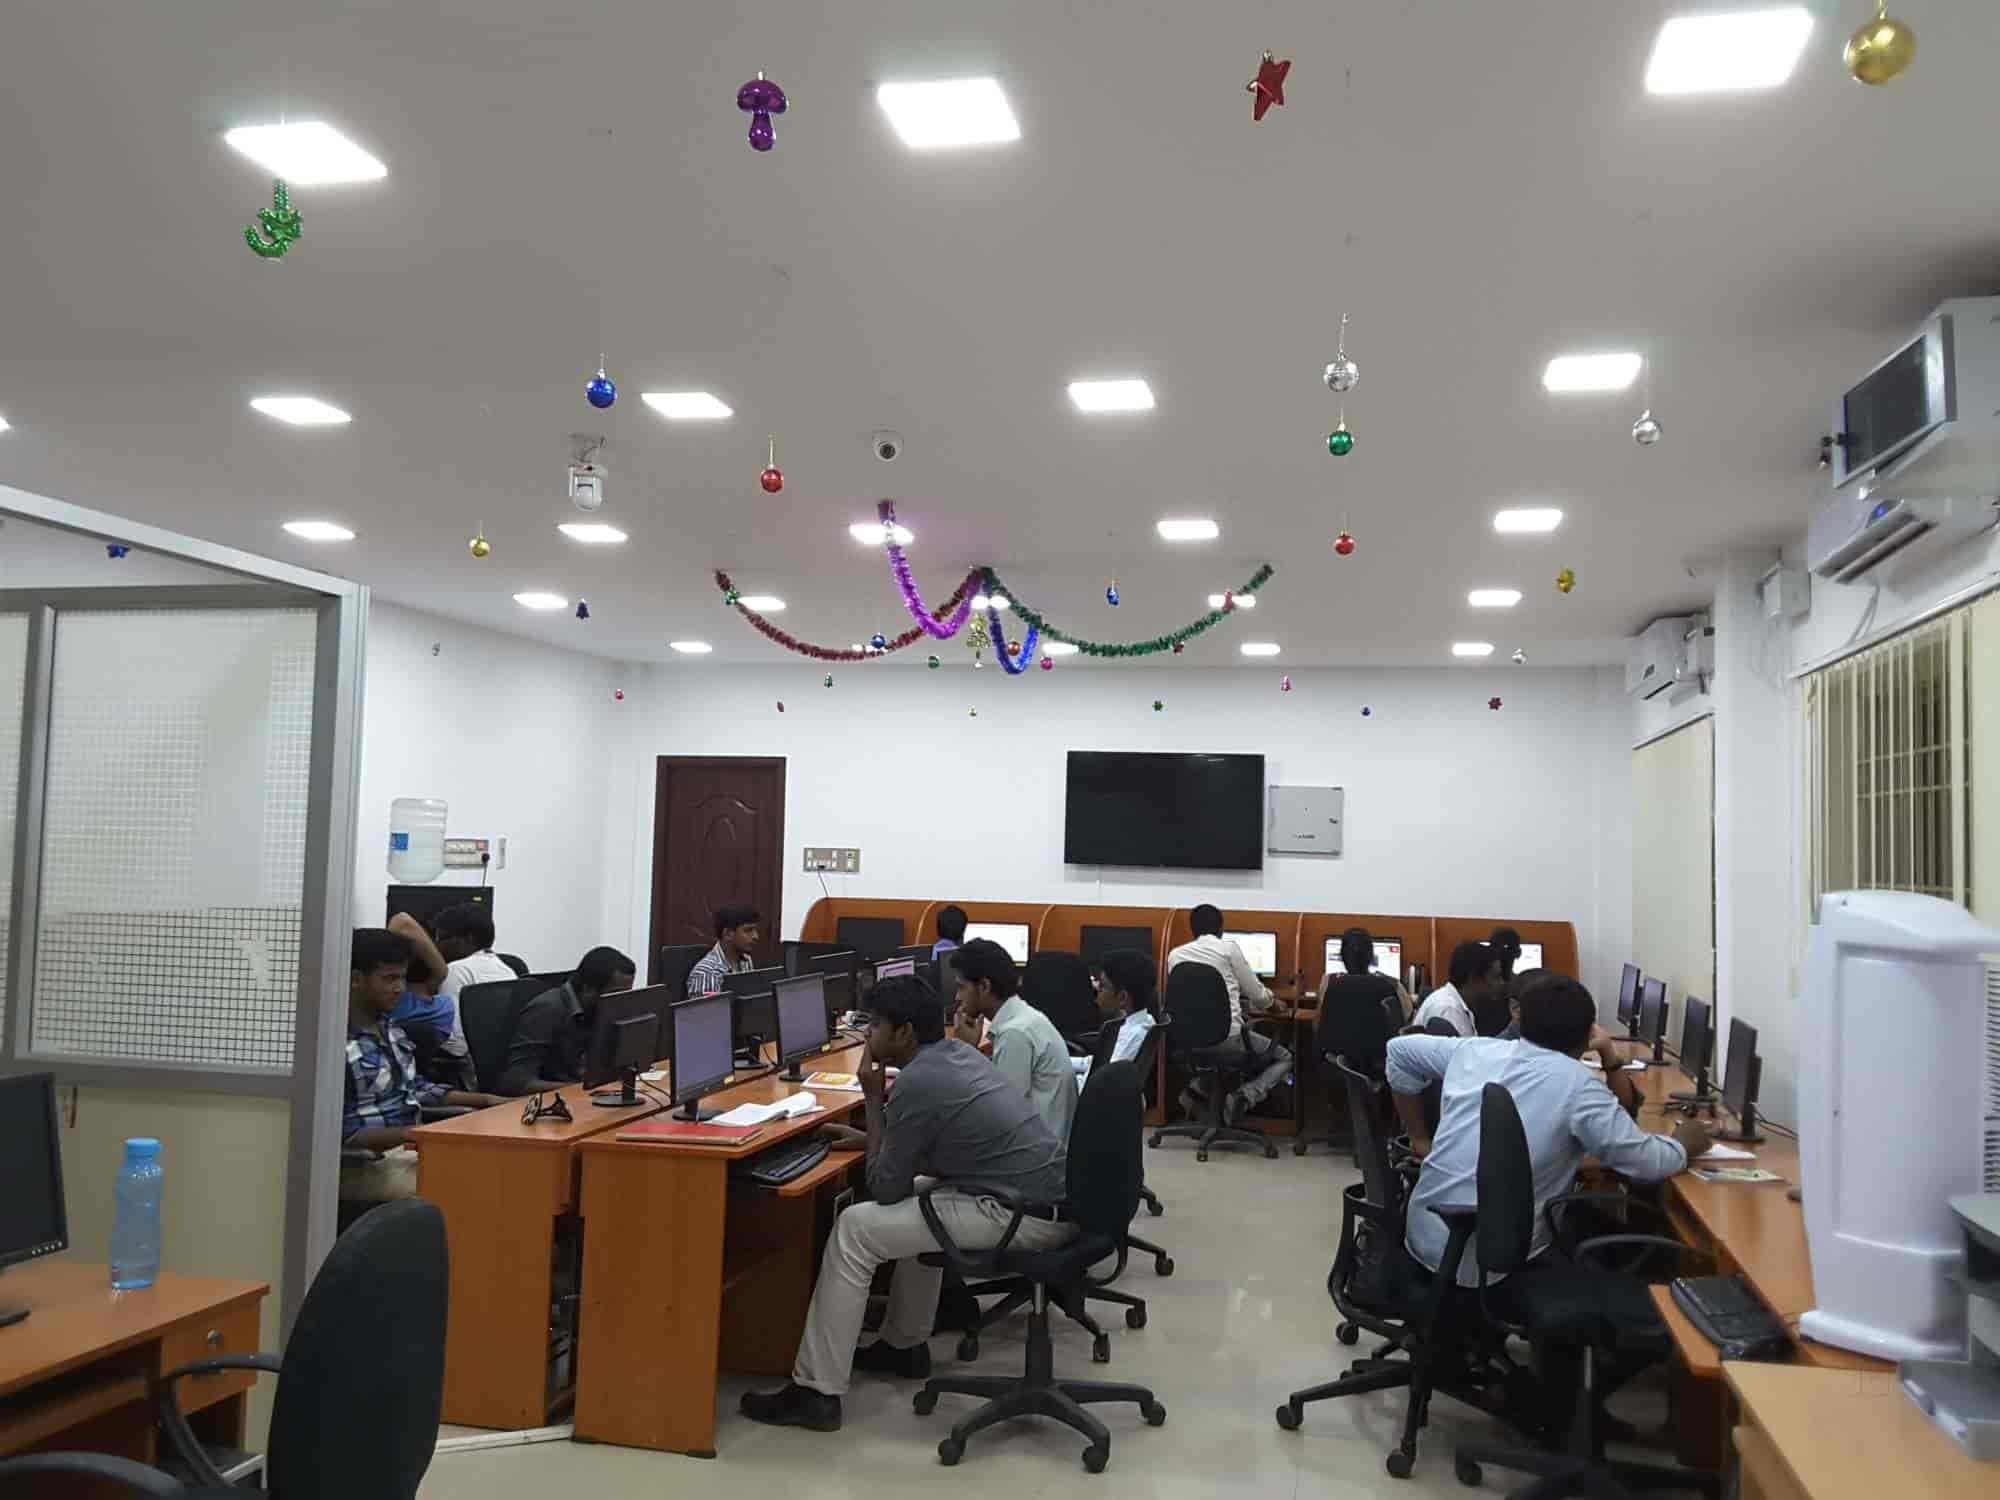 Top 100 Software Companies In Pondicherry स फ टव यर कम पन ज प ड च र Justdial